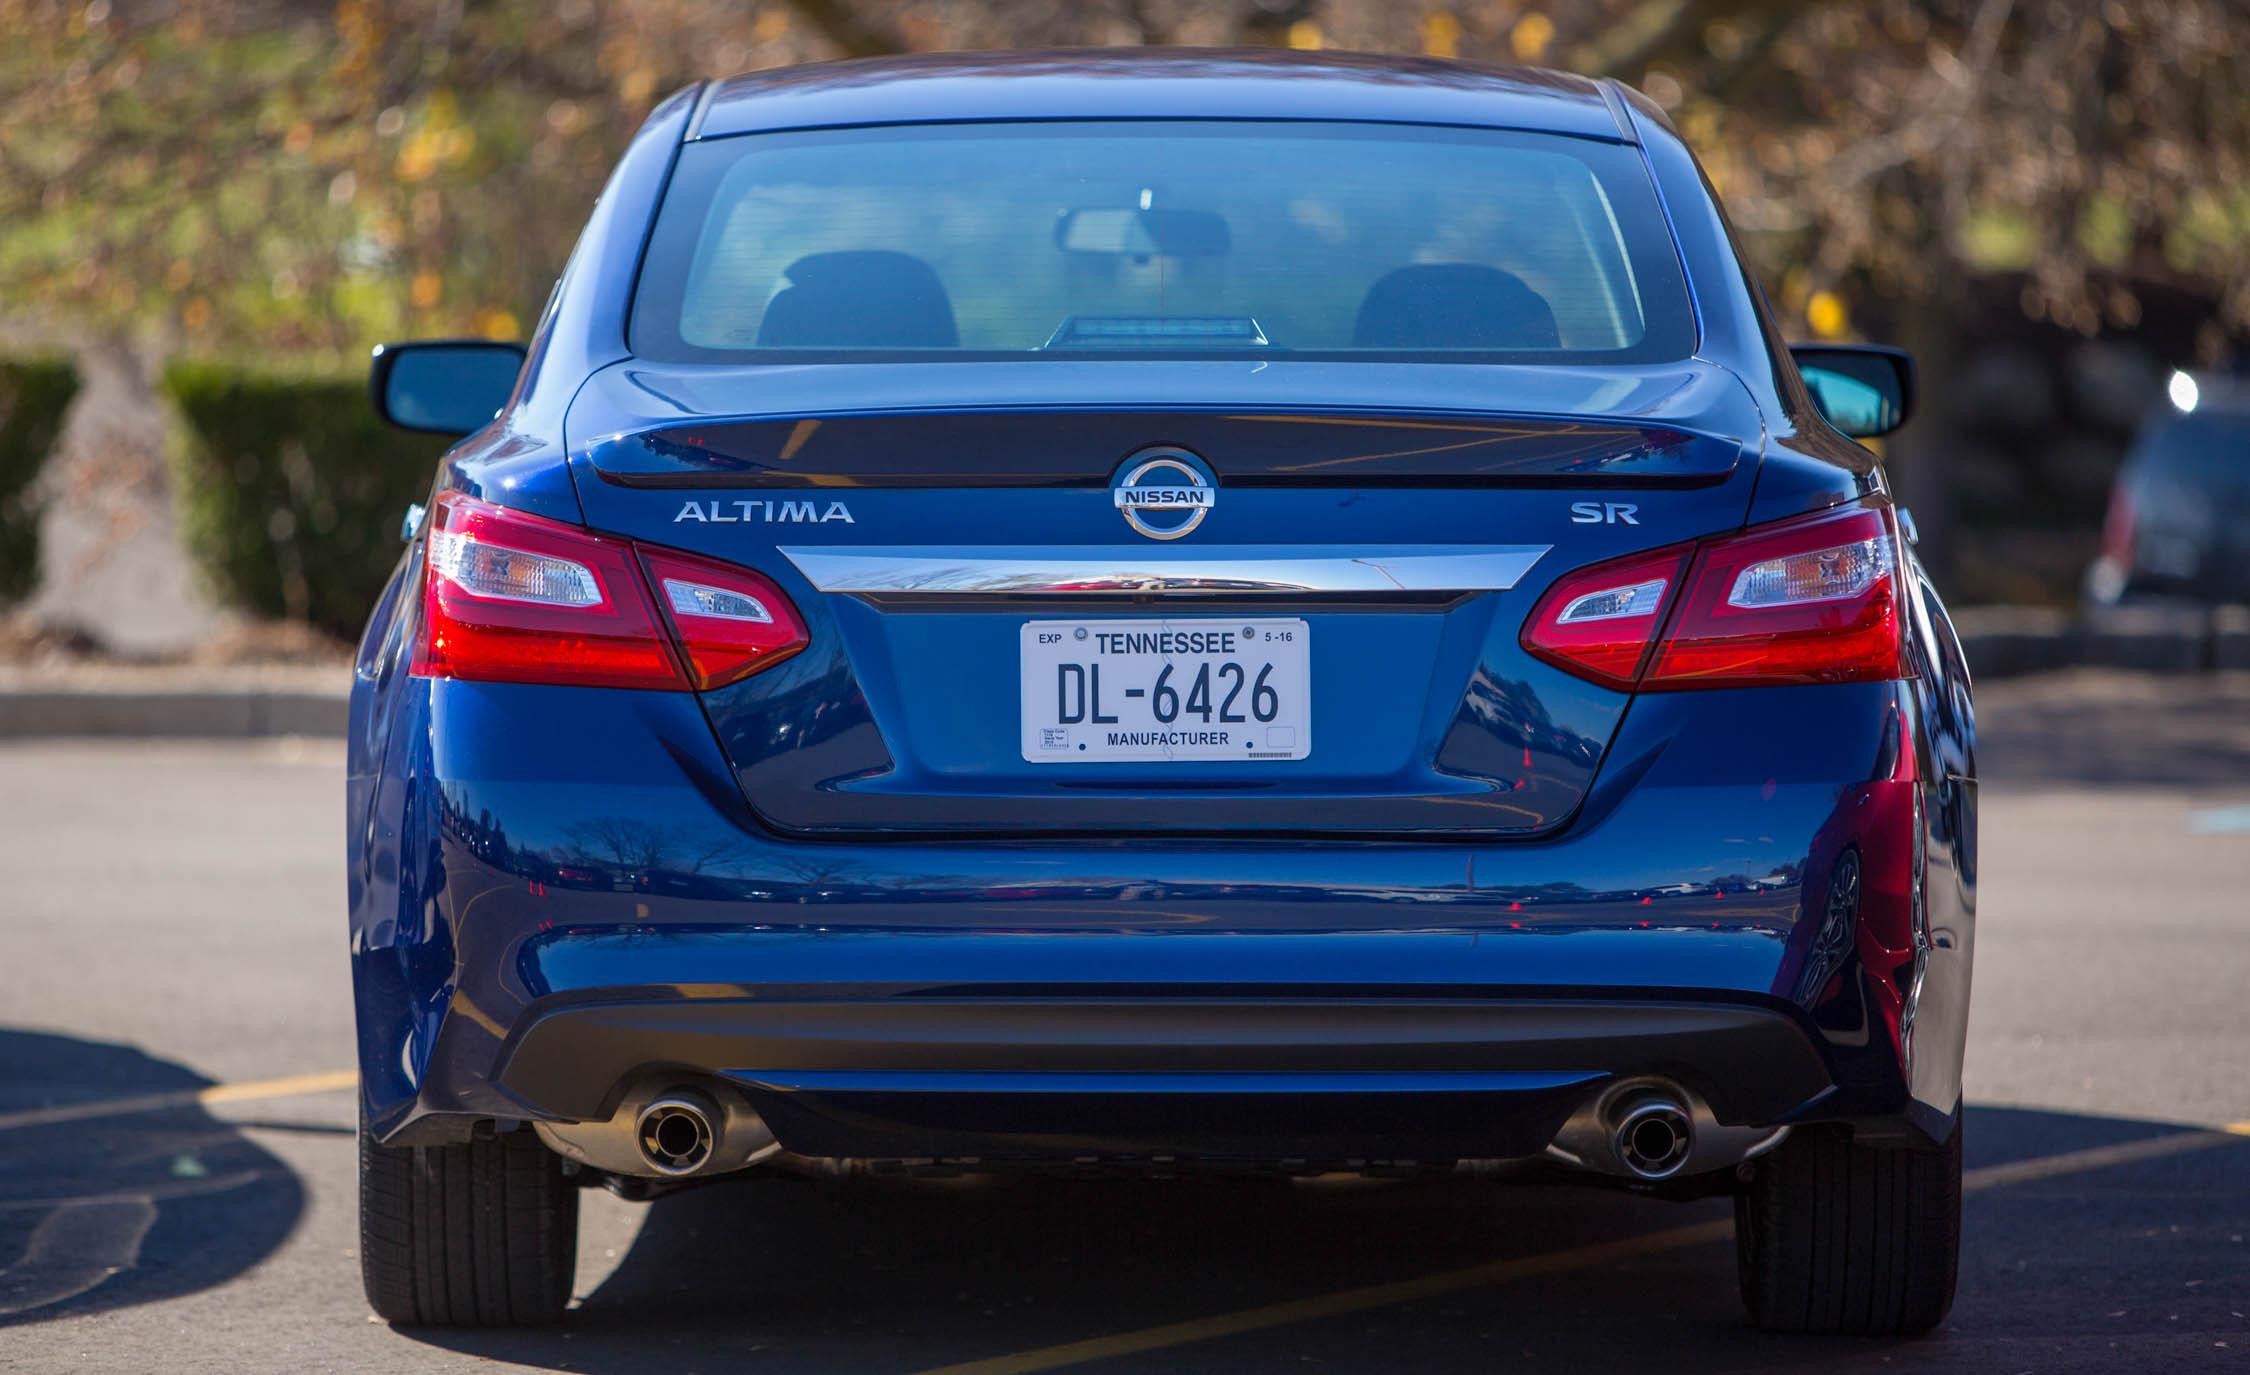 2016 Nissan Altima Exterior Rear End